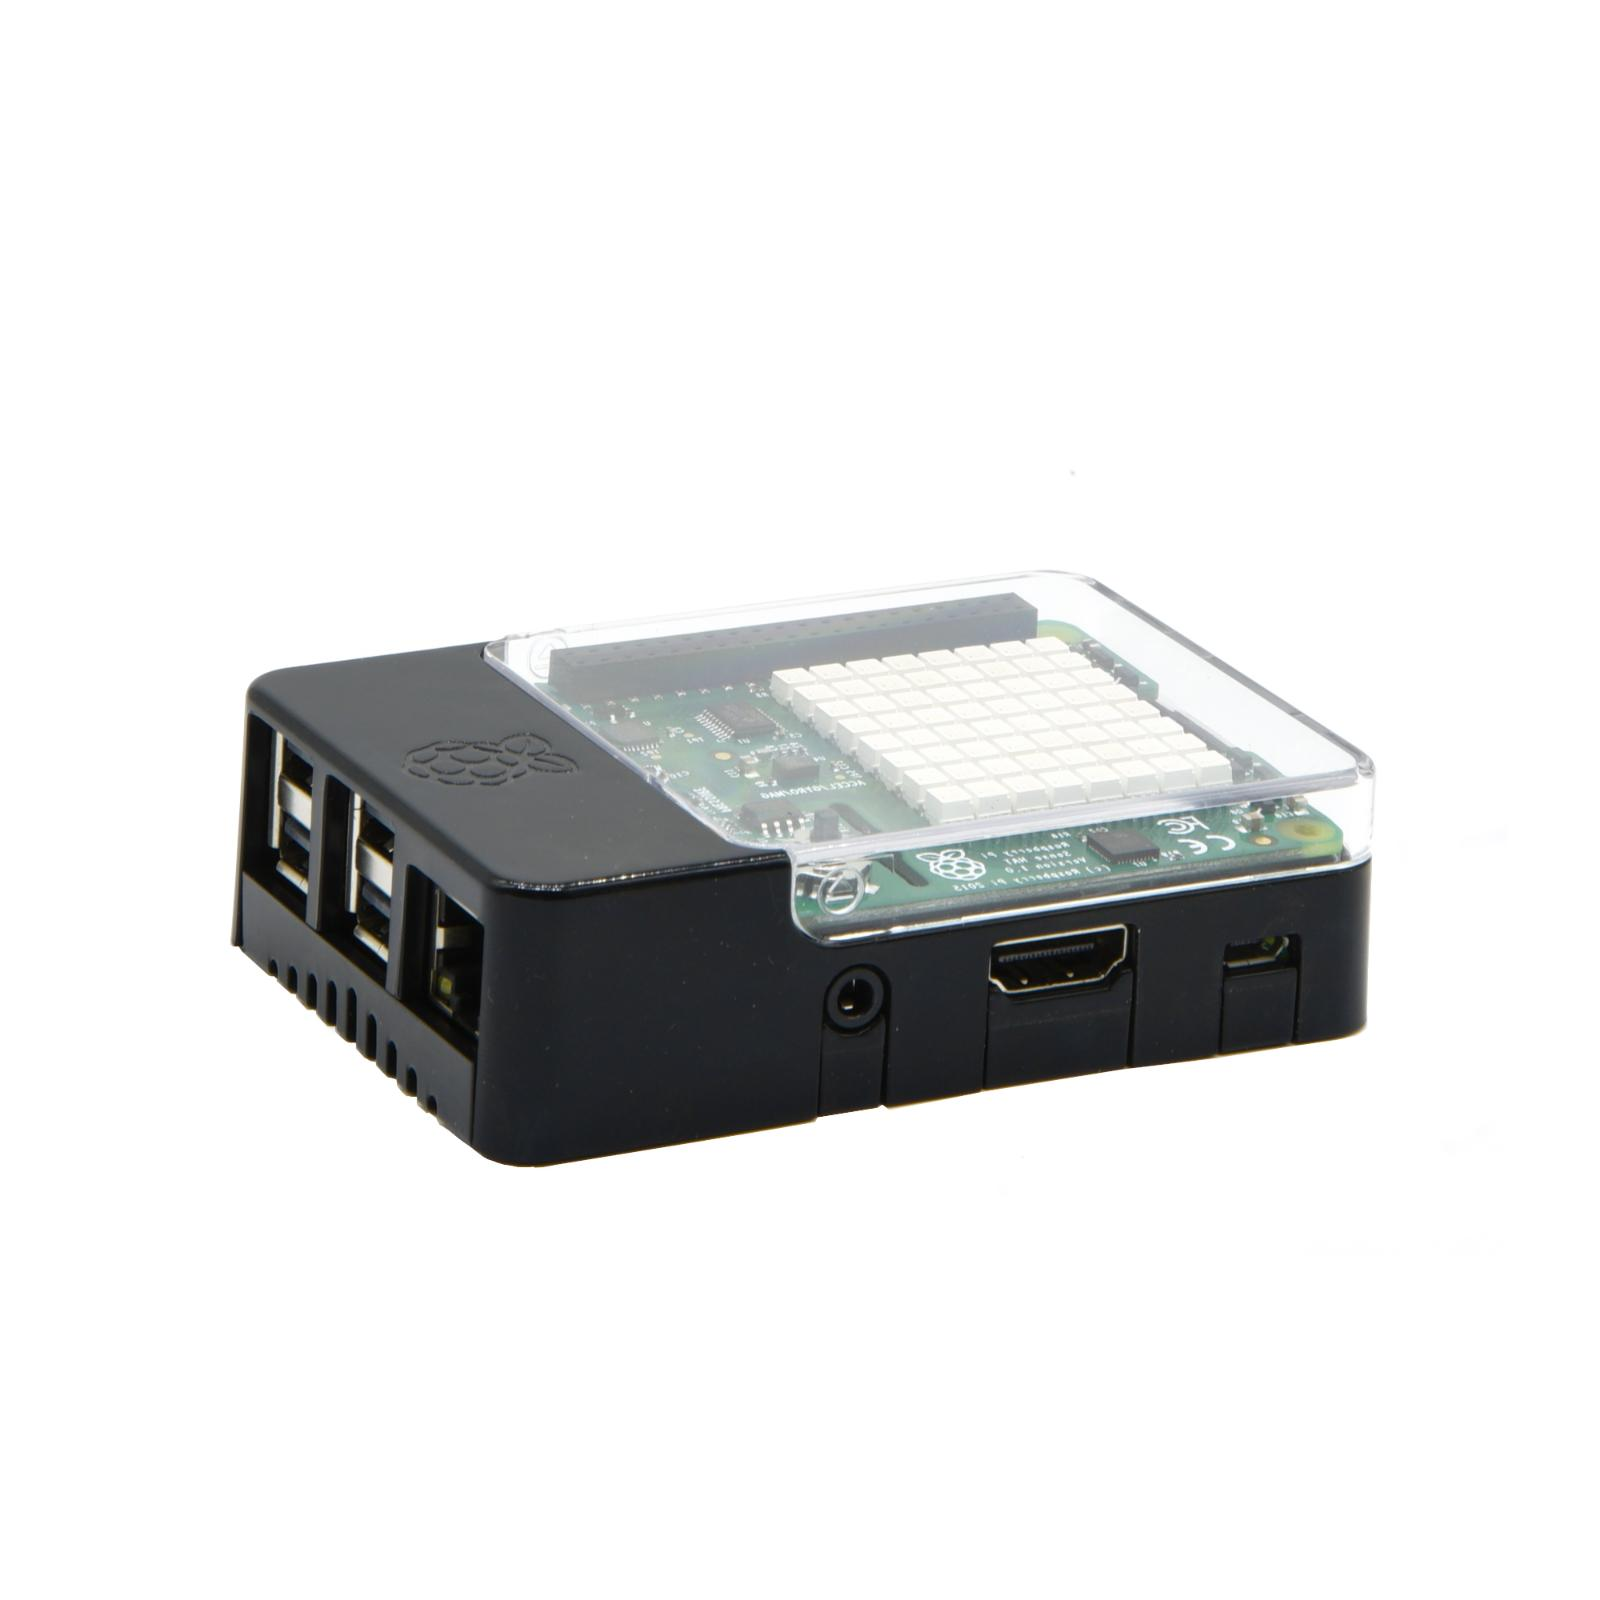 Raspberry Pi Sense Value PepperTech Digital